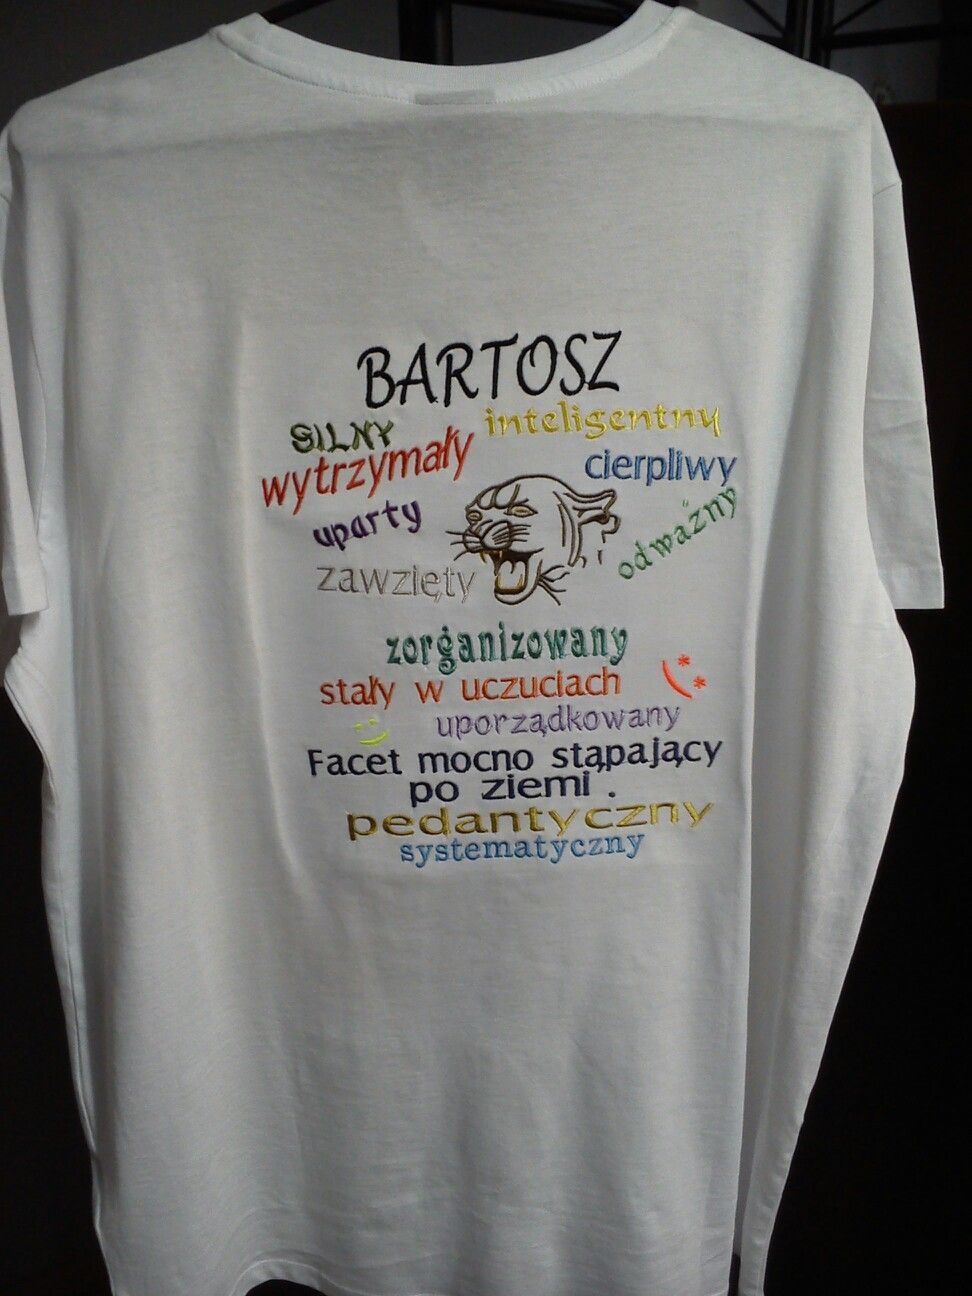 Napis Na Koszulce With Images Koszulki Uczucia